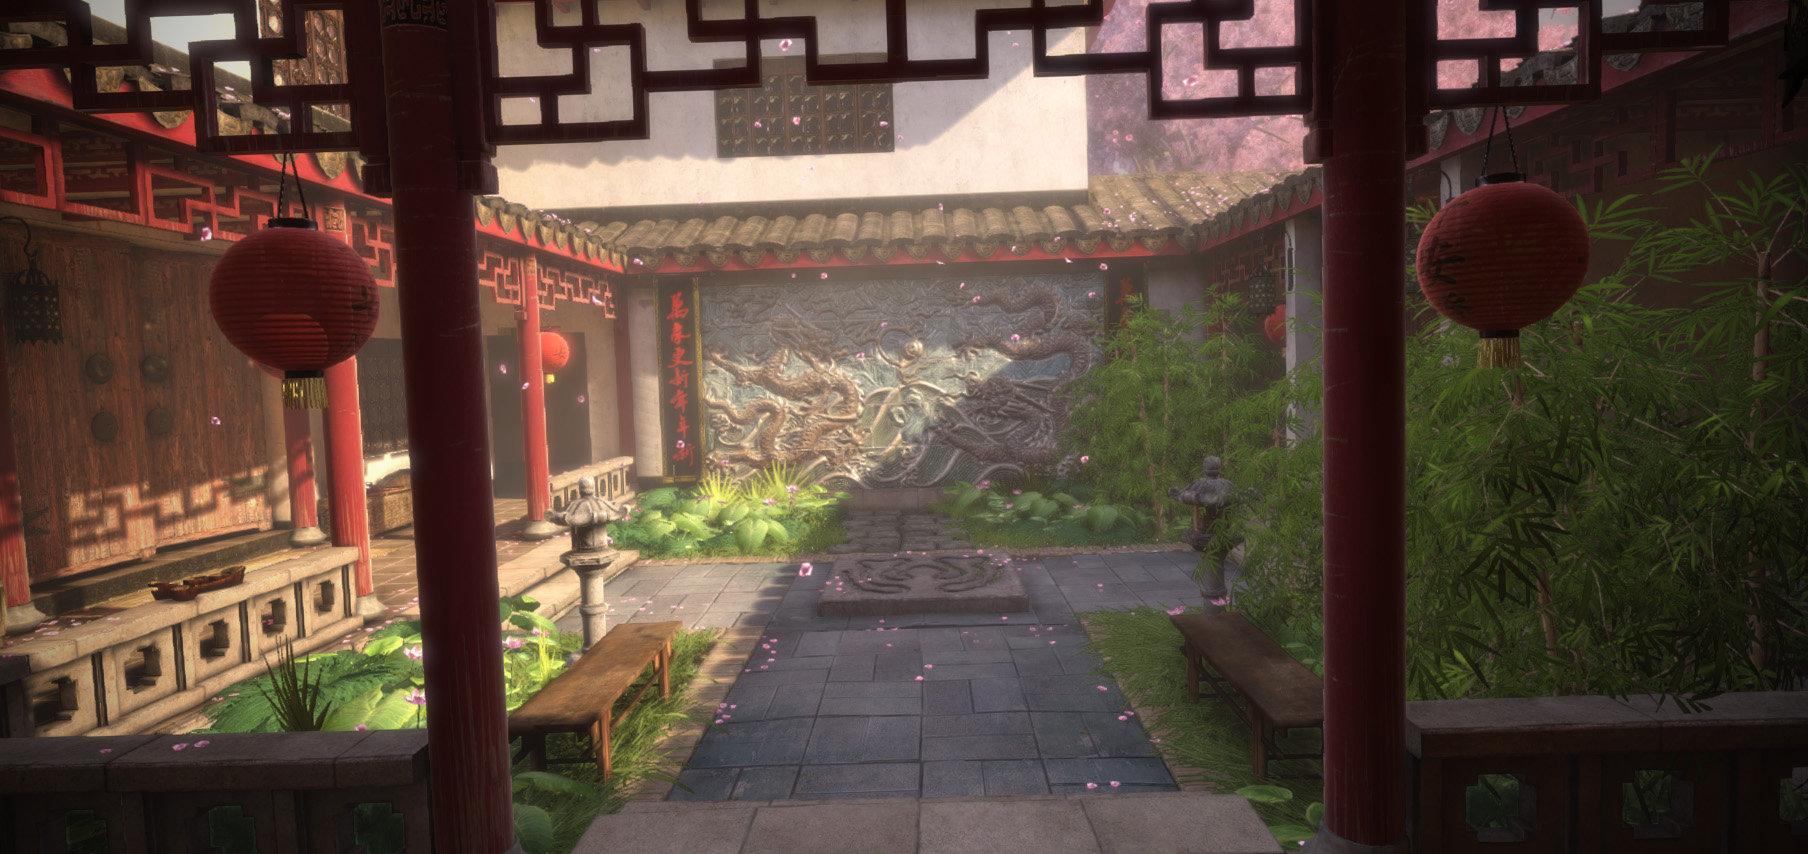 Jeff severson chinese courtyard day 08